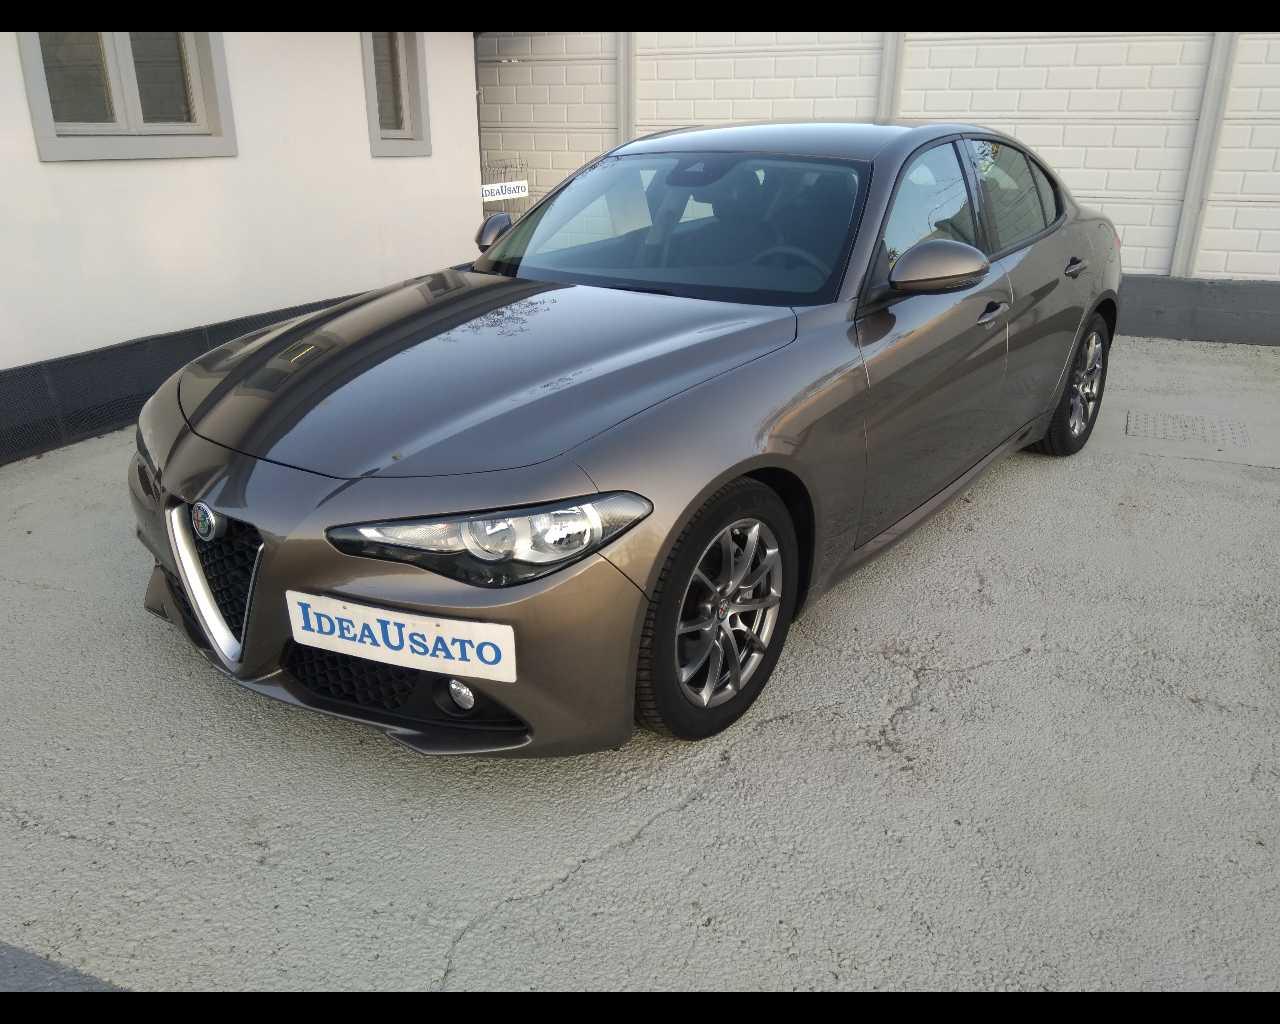 ALFA ROMEO  giulia 2.2 t Super 150cv, Diesel, €18.900 - Giulia Diesel - Giulia 2.2 T Super 150cv